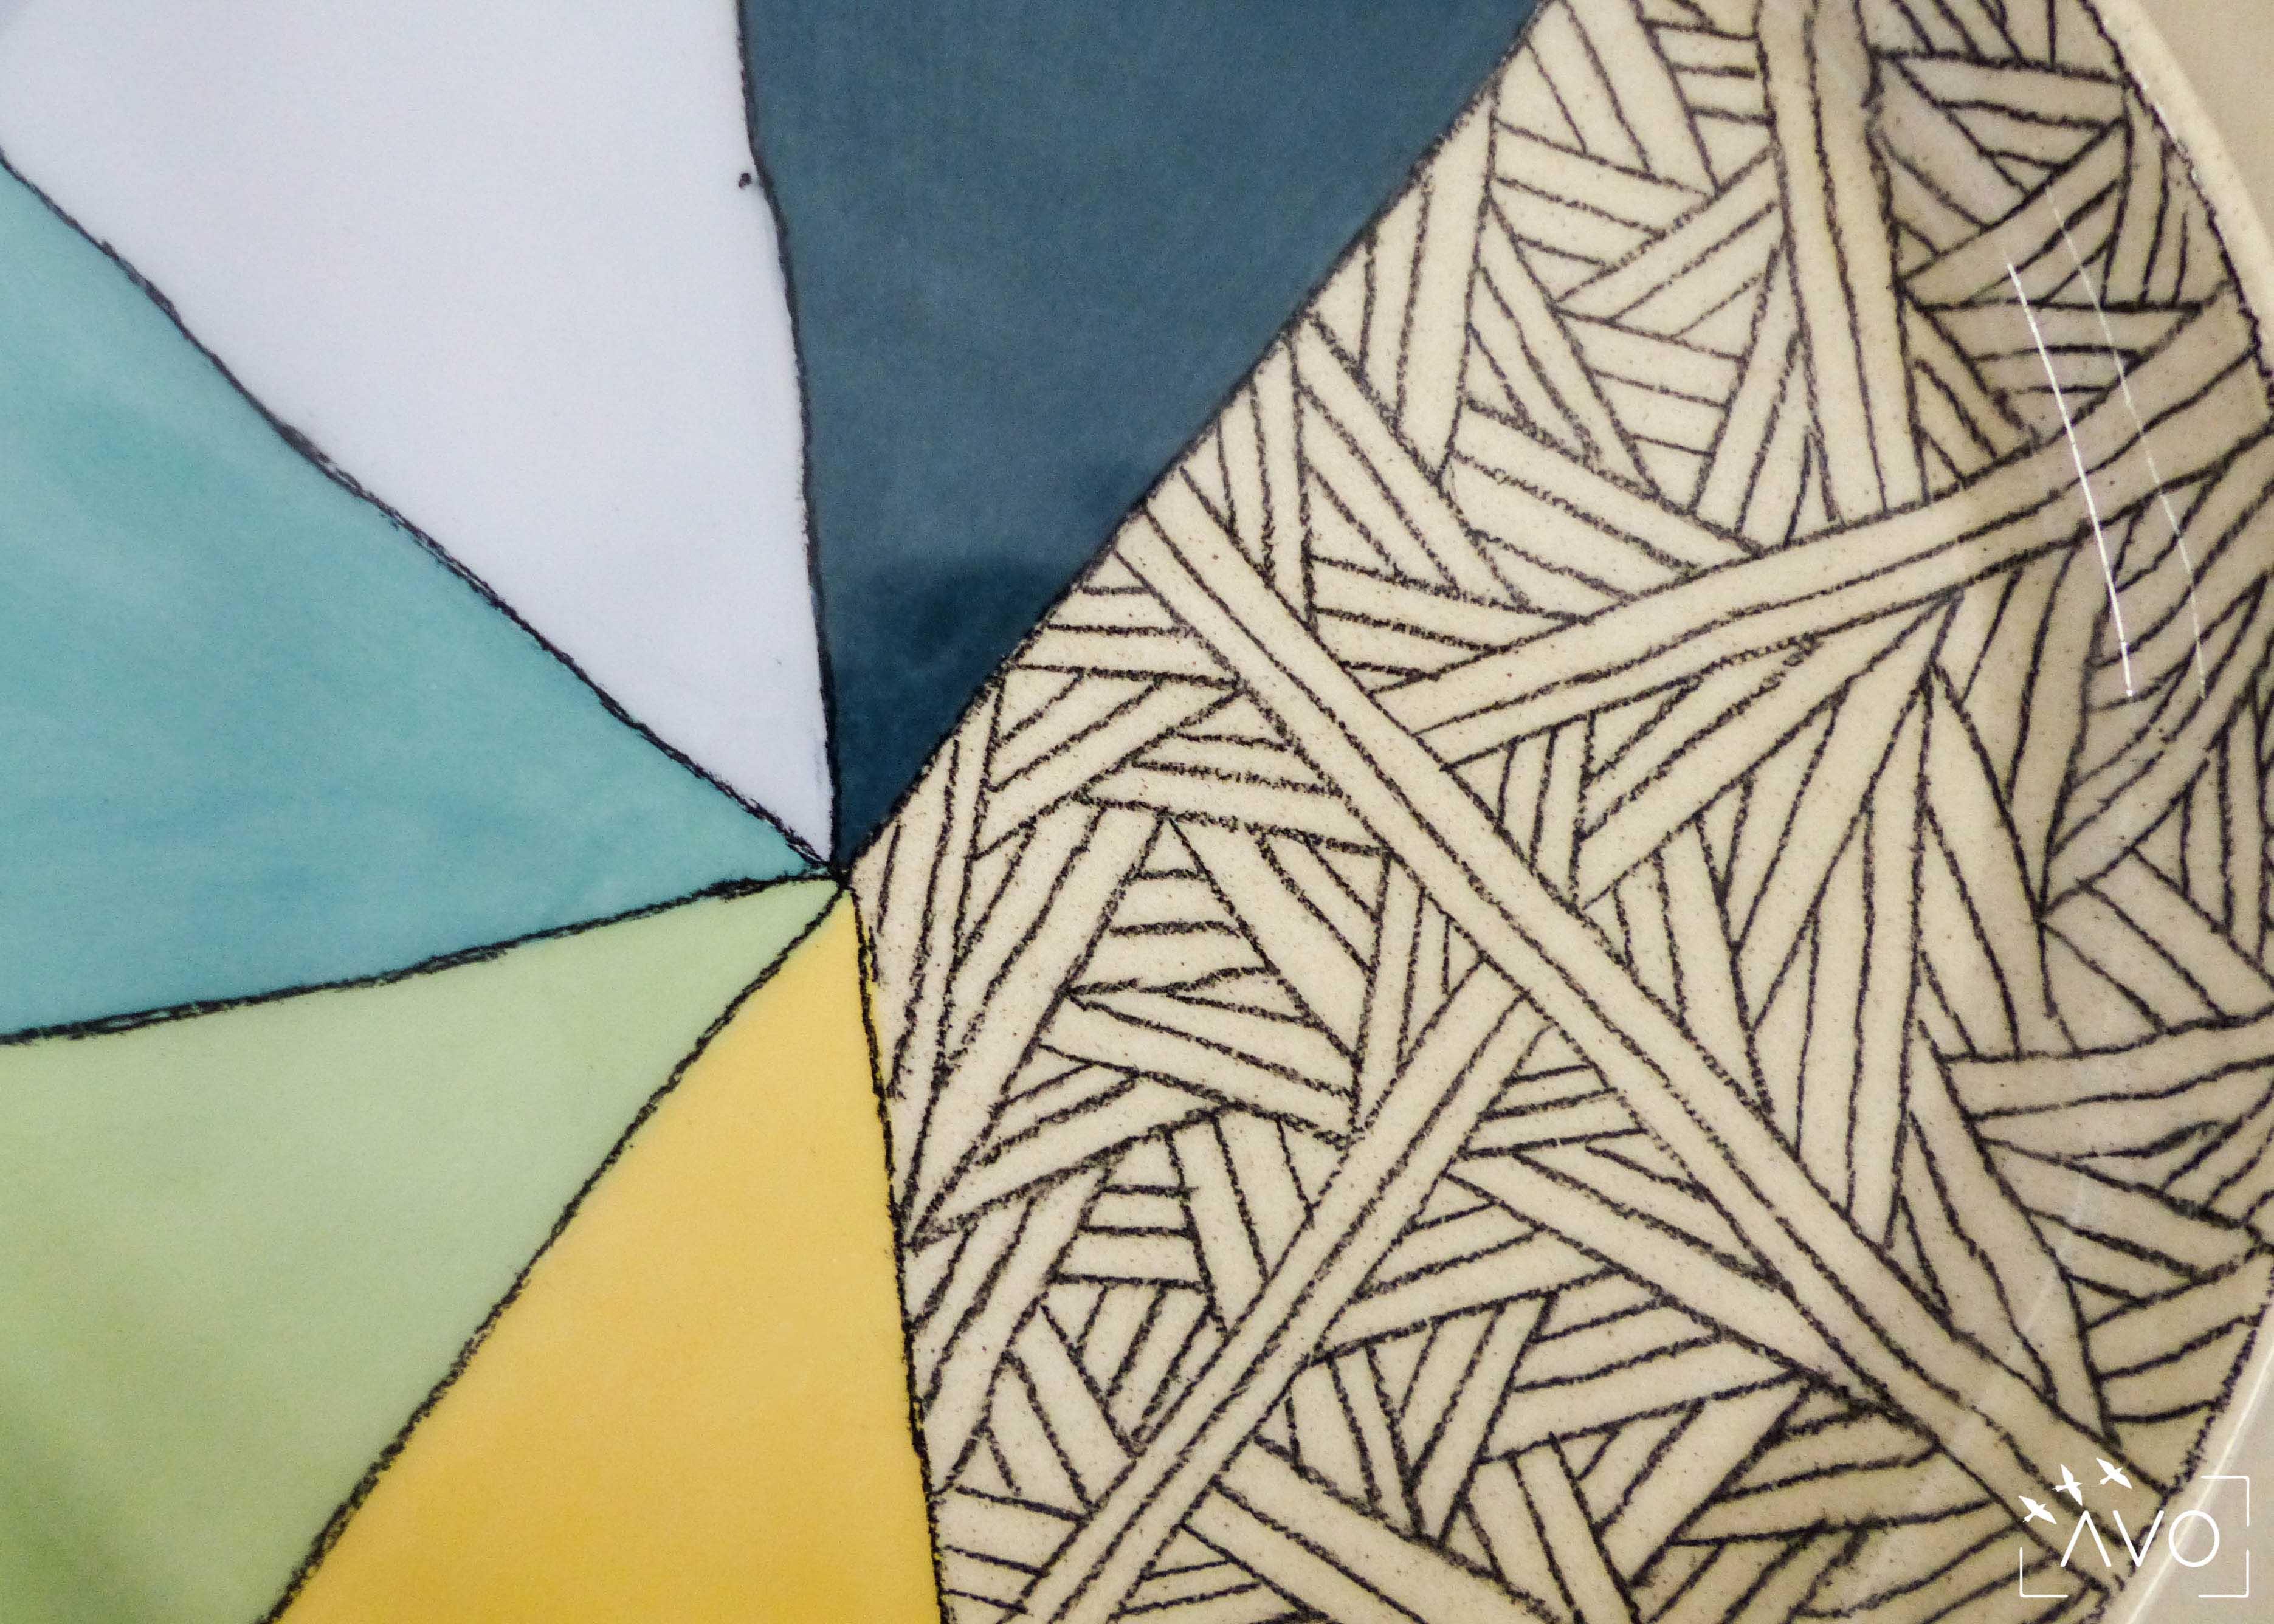 savoir-faire-ceramique-faience-decoration-bol-plat-creatrice-colore-email-terre-local-sabine-orlandini-motif